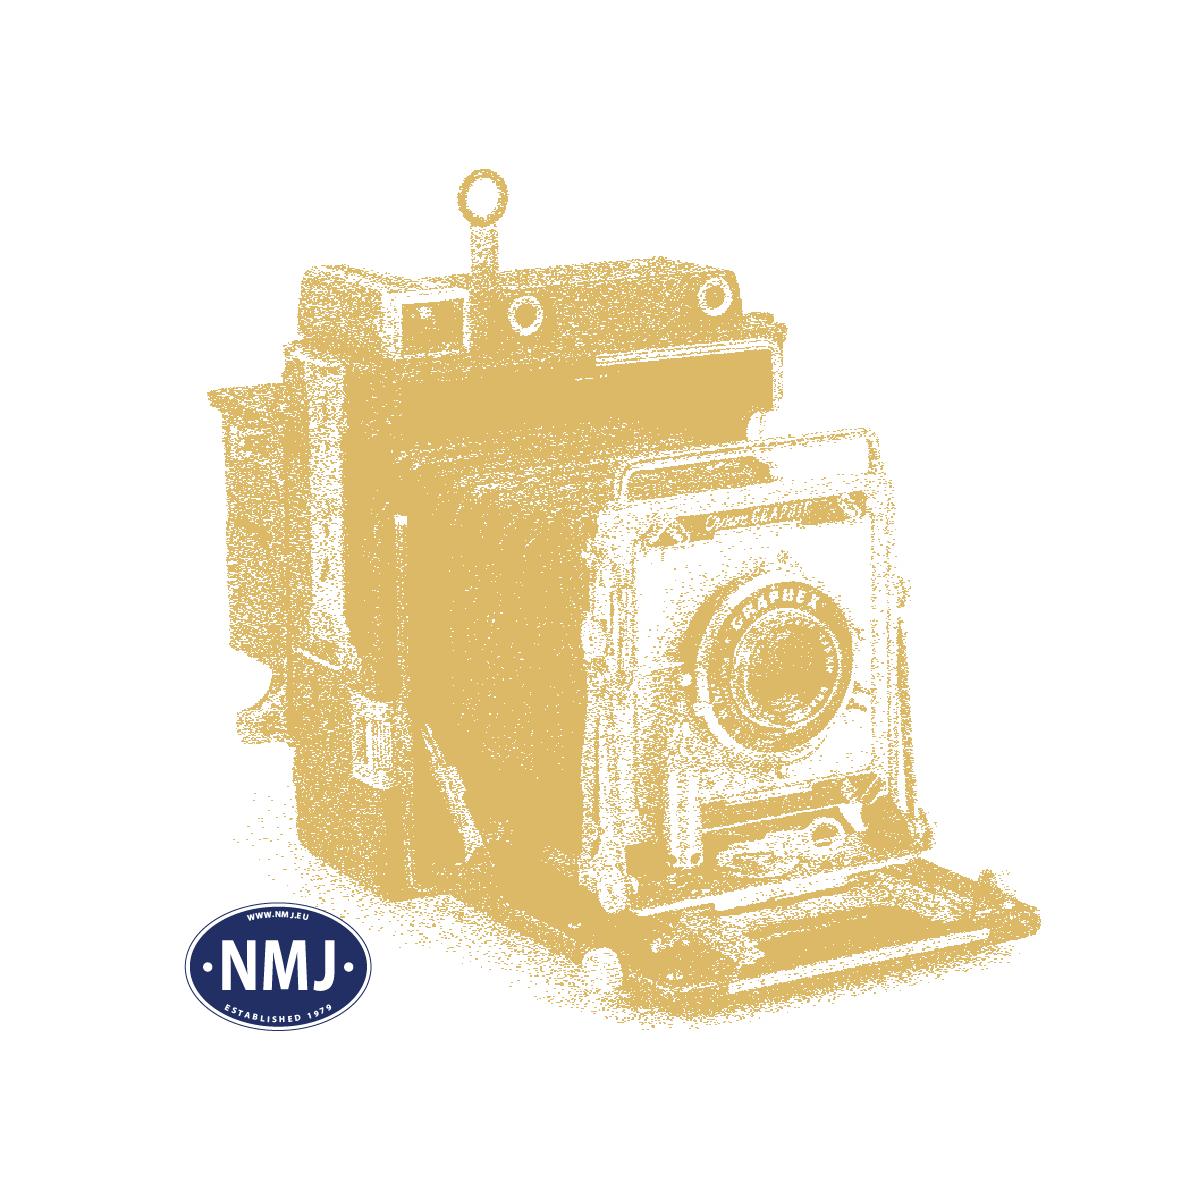 NMJSTl460507 - NMJ Superline NSB Stakevogn Tl4 60507 m/ Sidelemmer